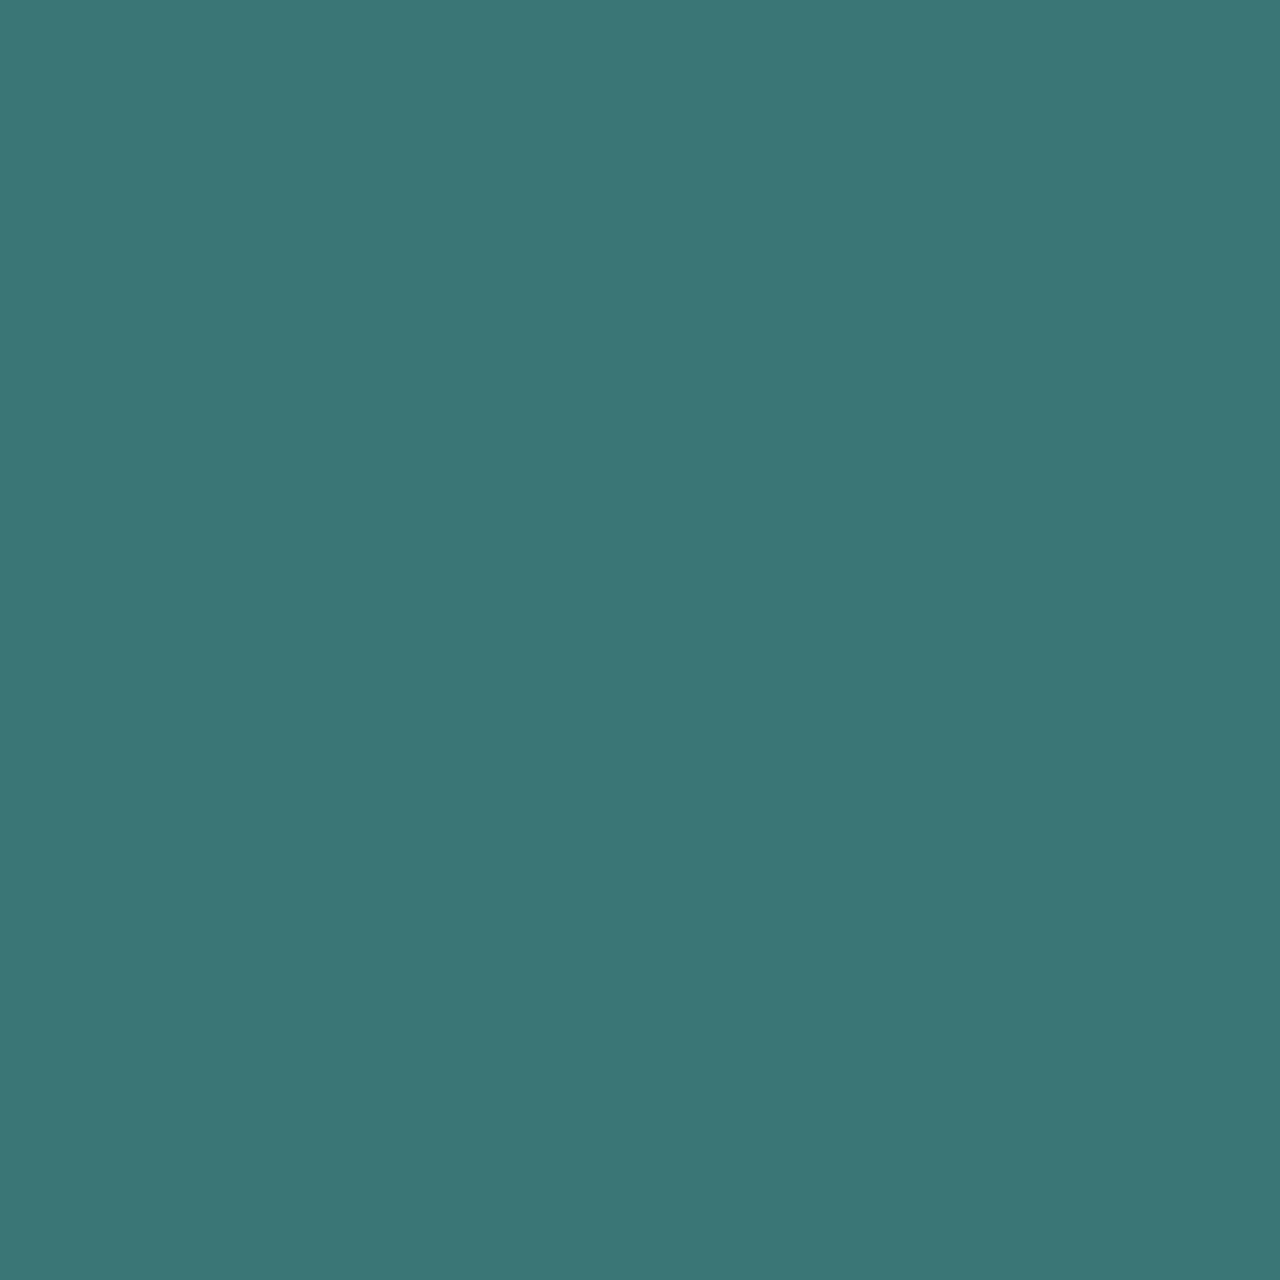 Rosco Calcolor Sheet #4390: 90 Cyan, Gels